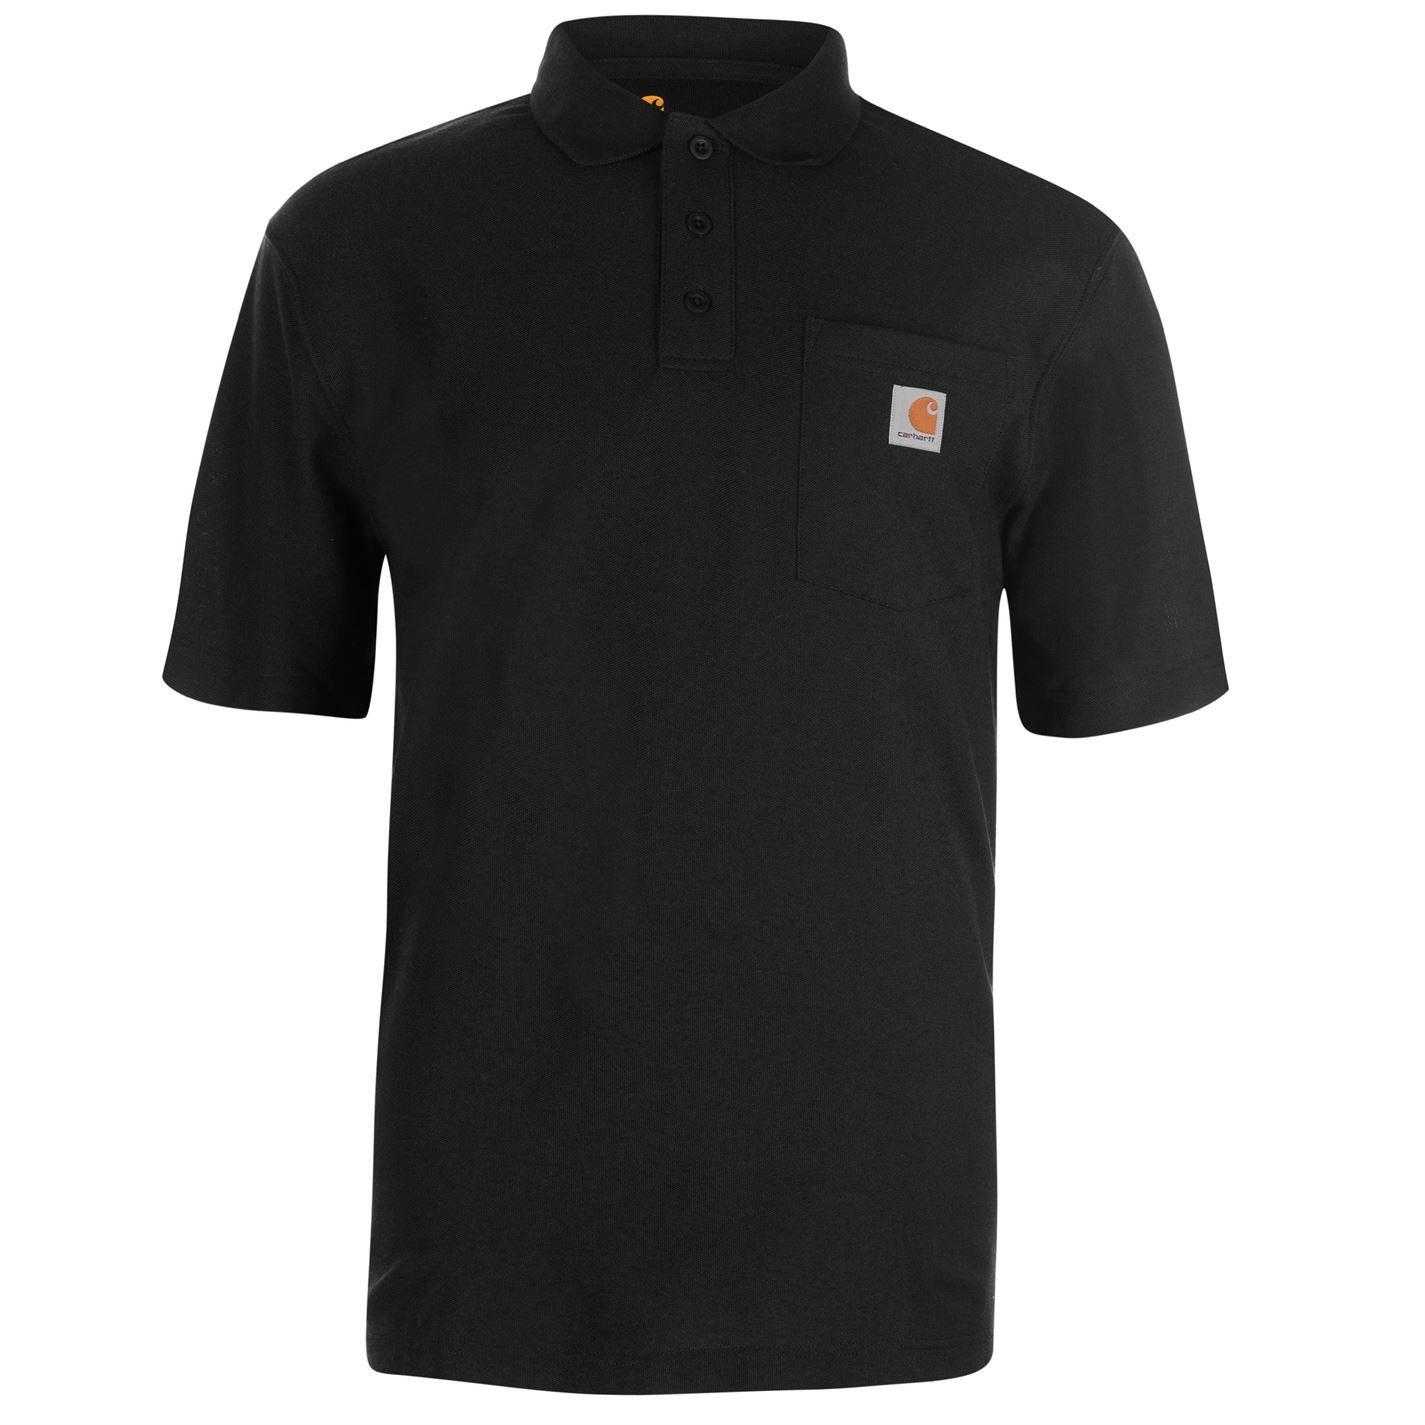 Carhartt Work Pocket Polo Shirt Mens Activewear Athleisure Top Tee Navy Small